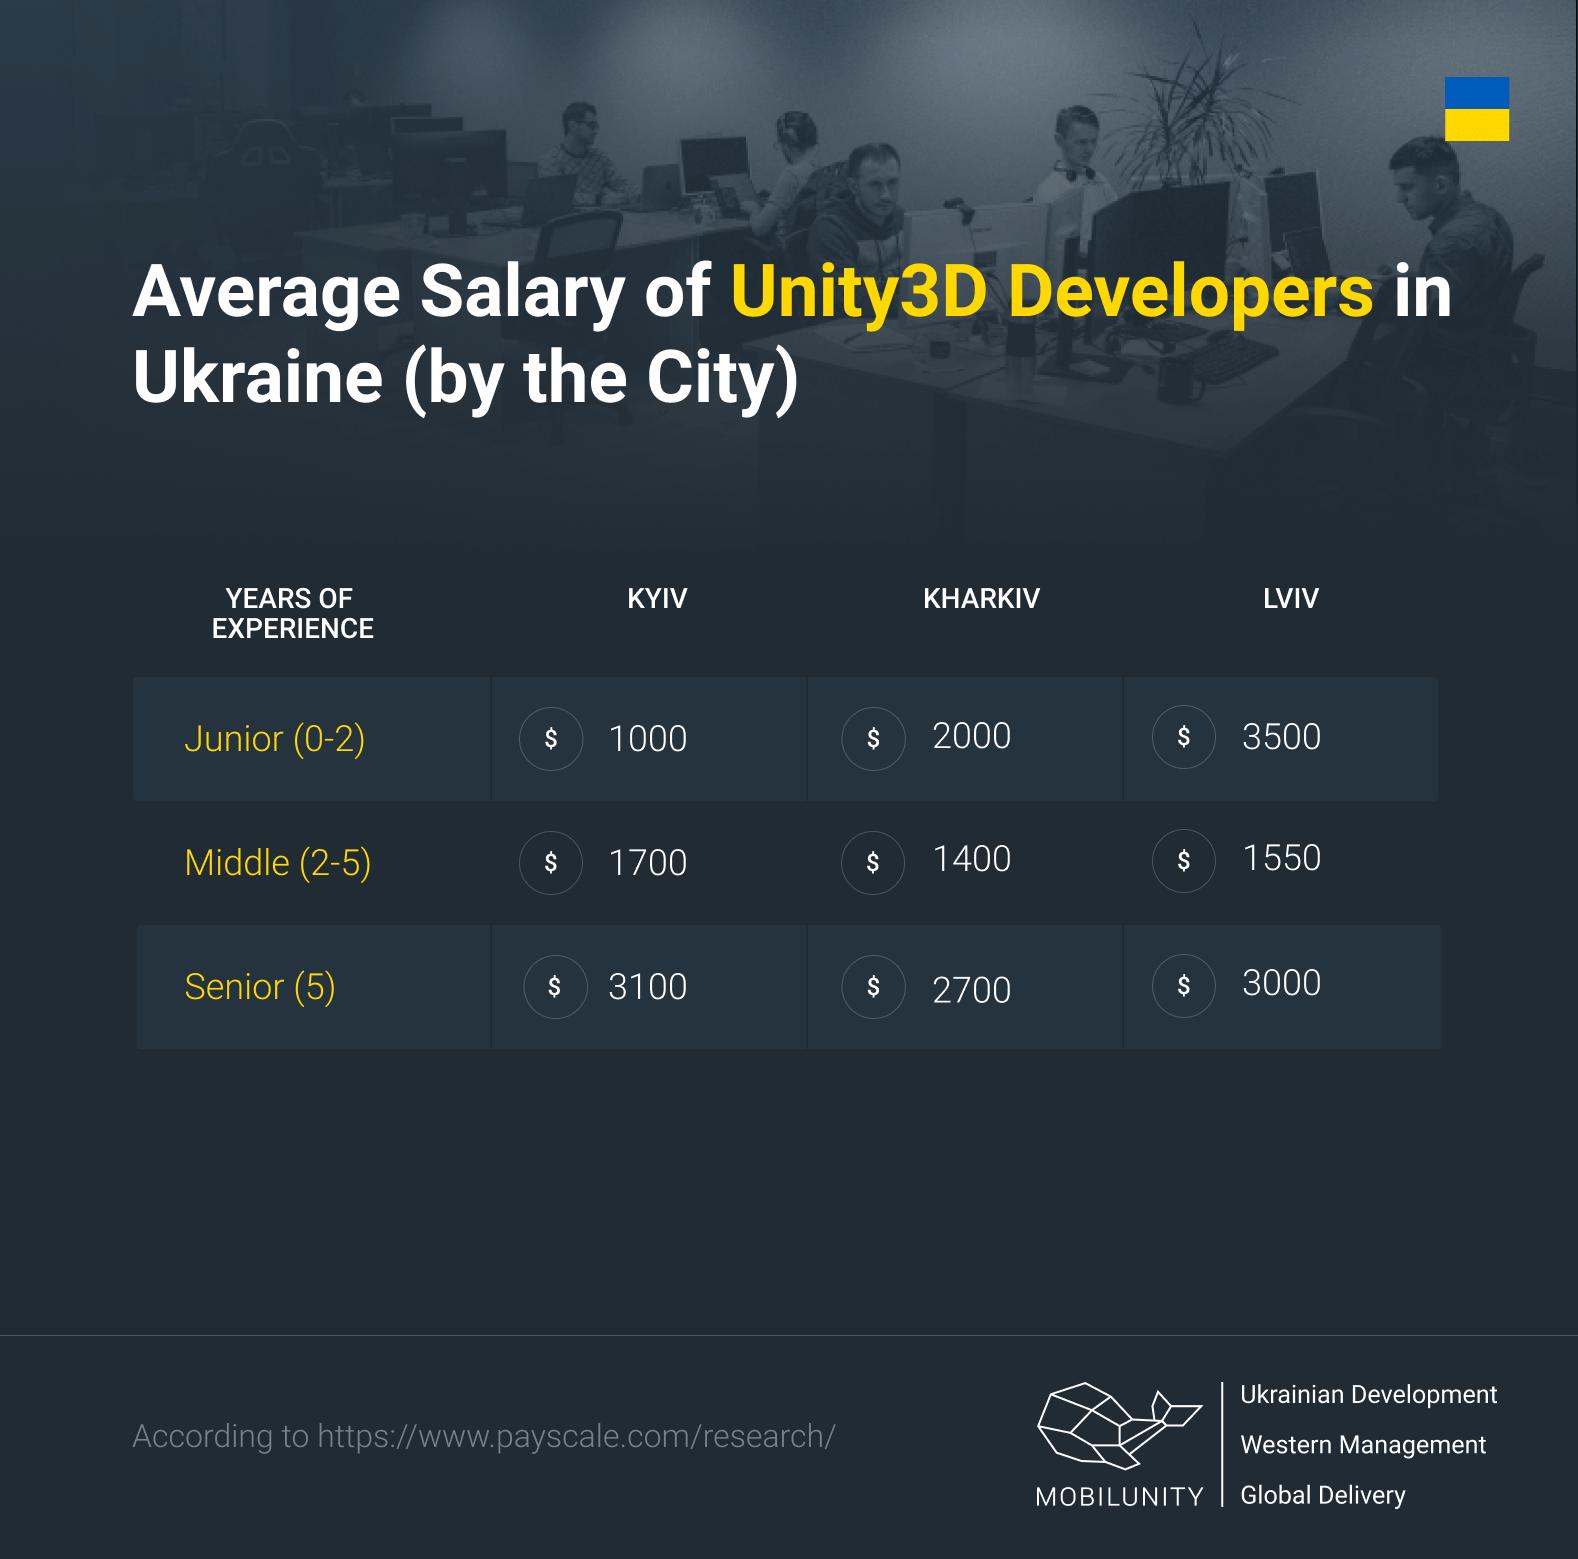 Unity3D developer salary in Ukraine